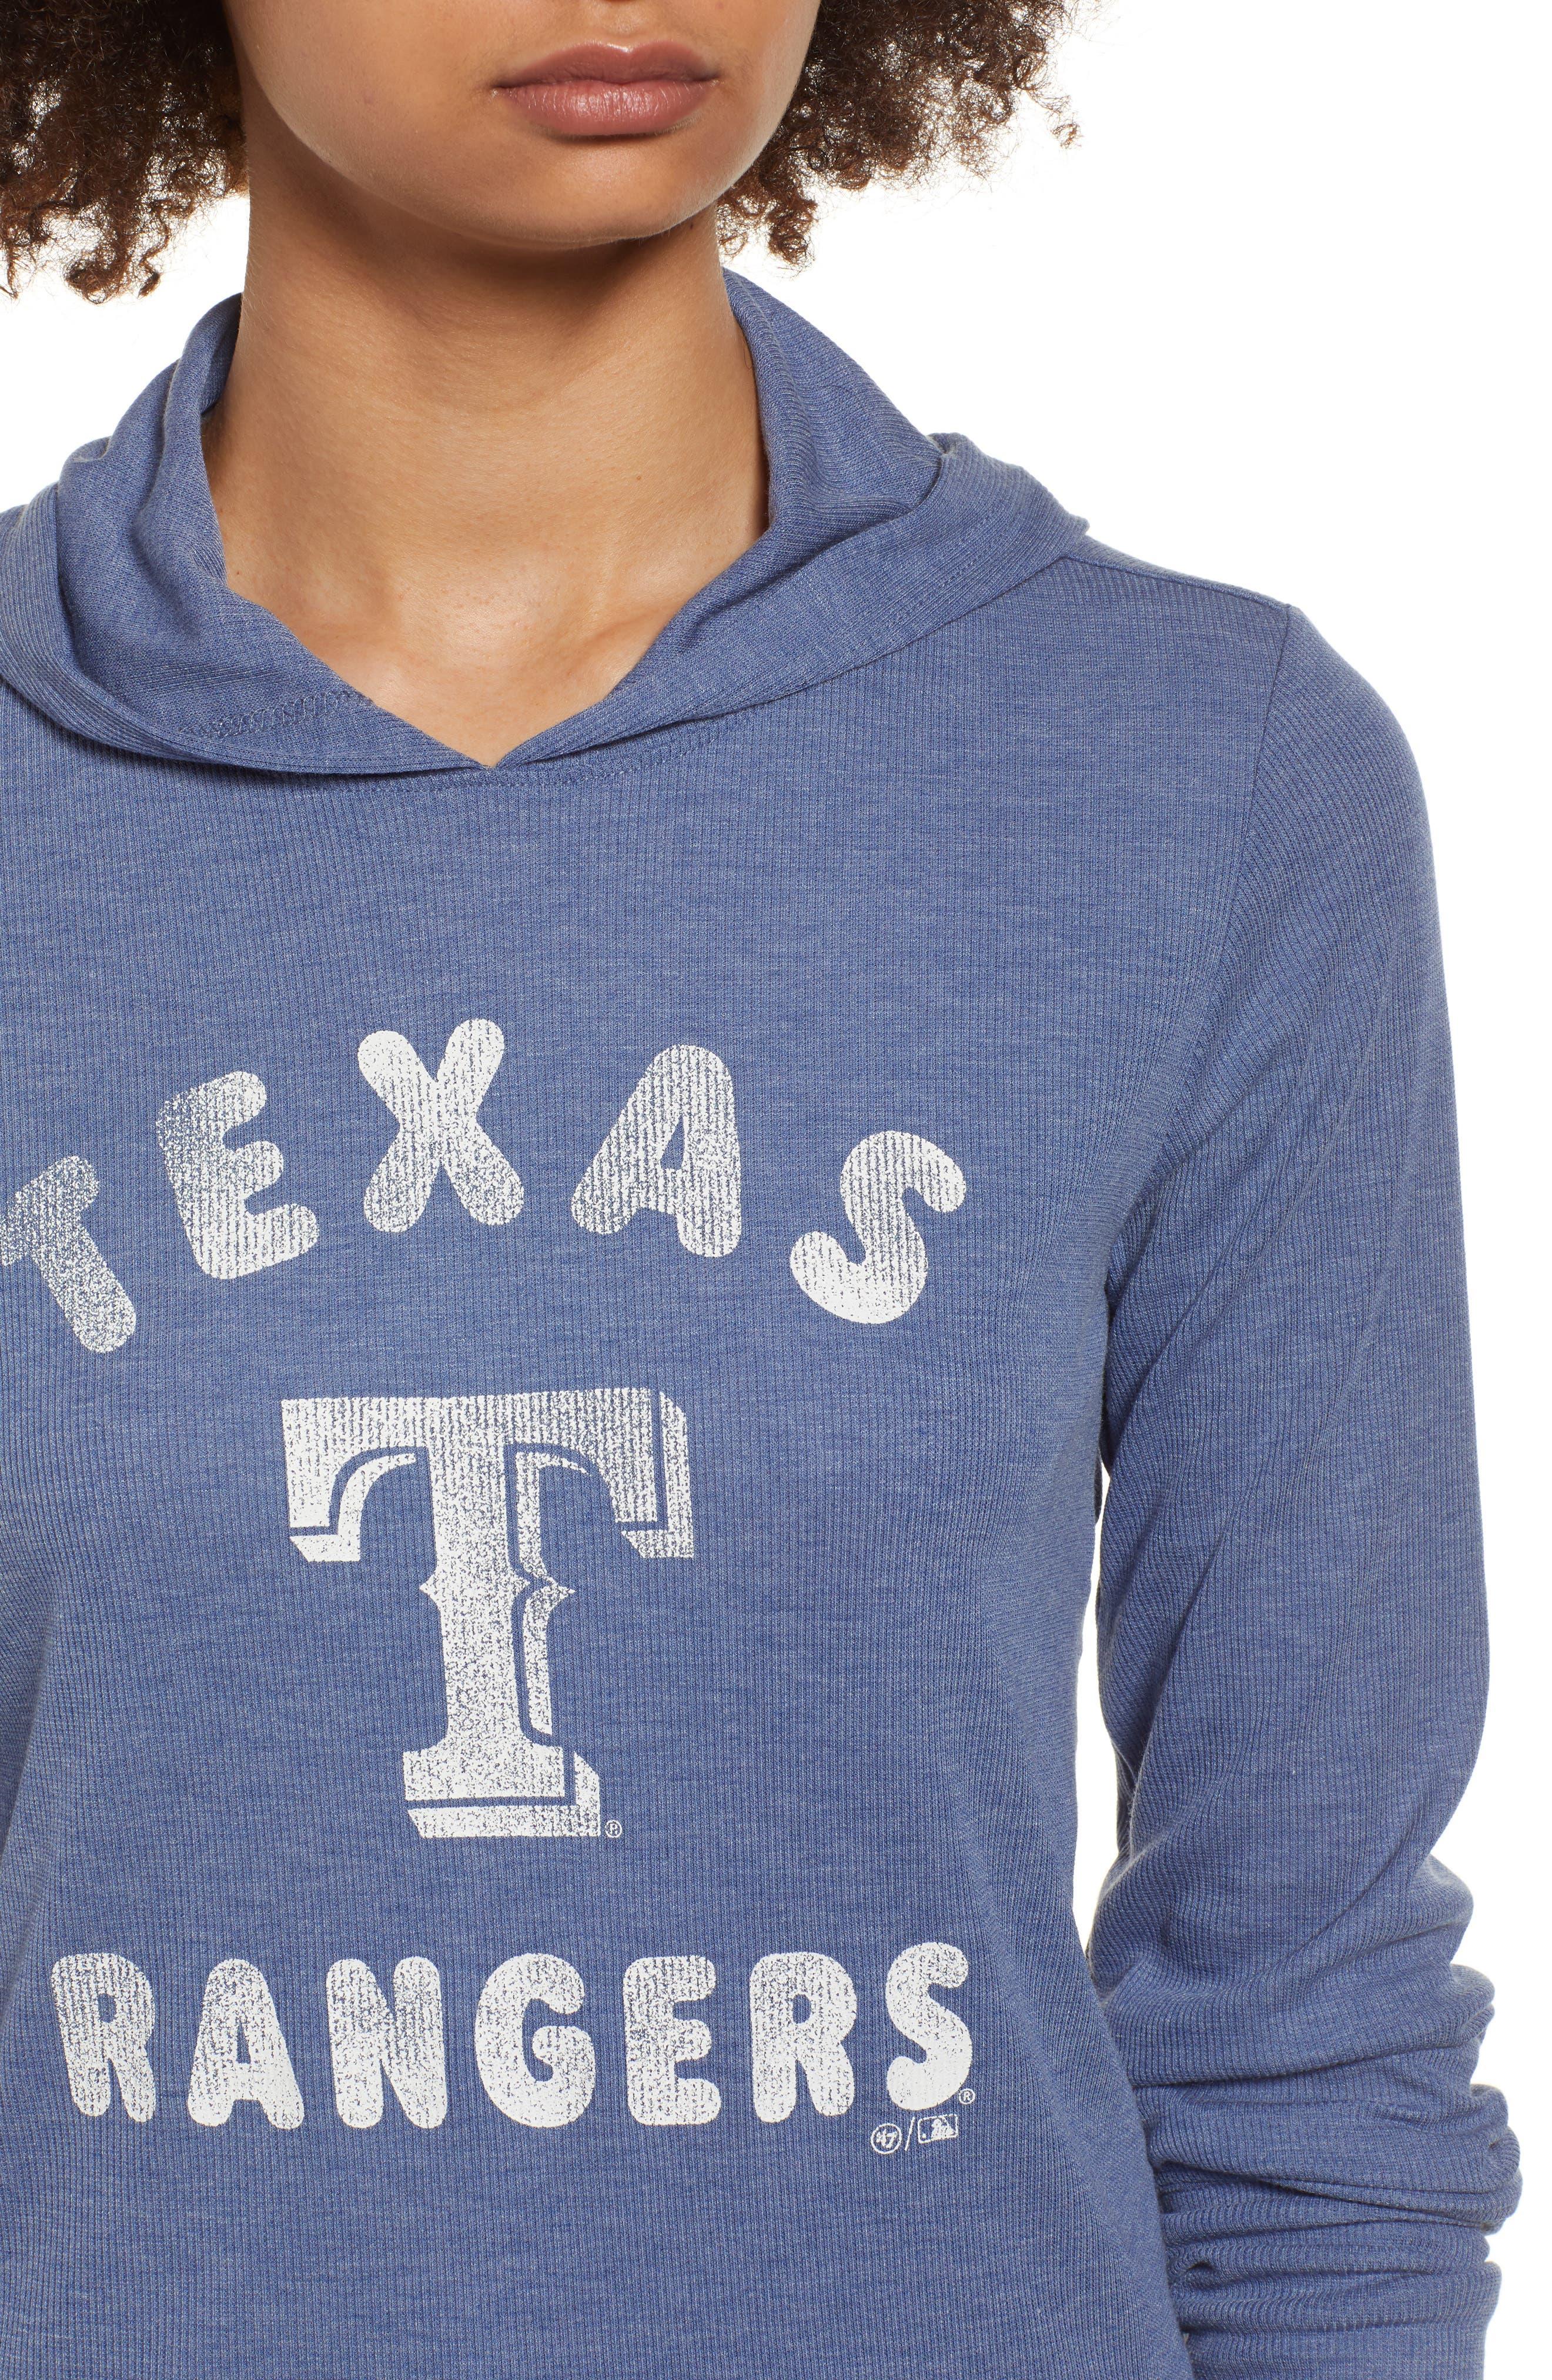 Campbell Texas Rangers Rib Knit Hooded Top,                             Alternate thumbnail 4, color,                             Bleacher Blue